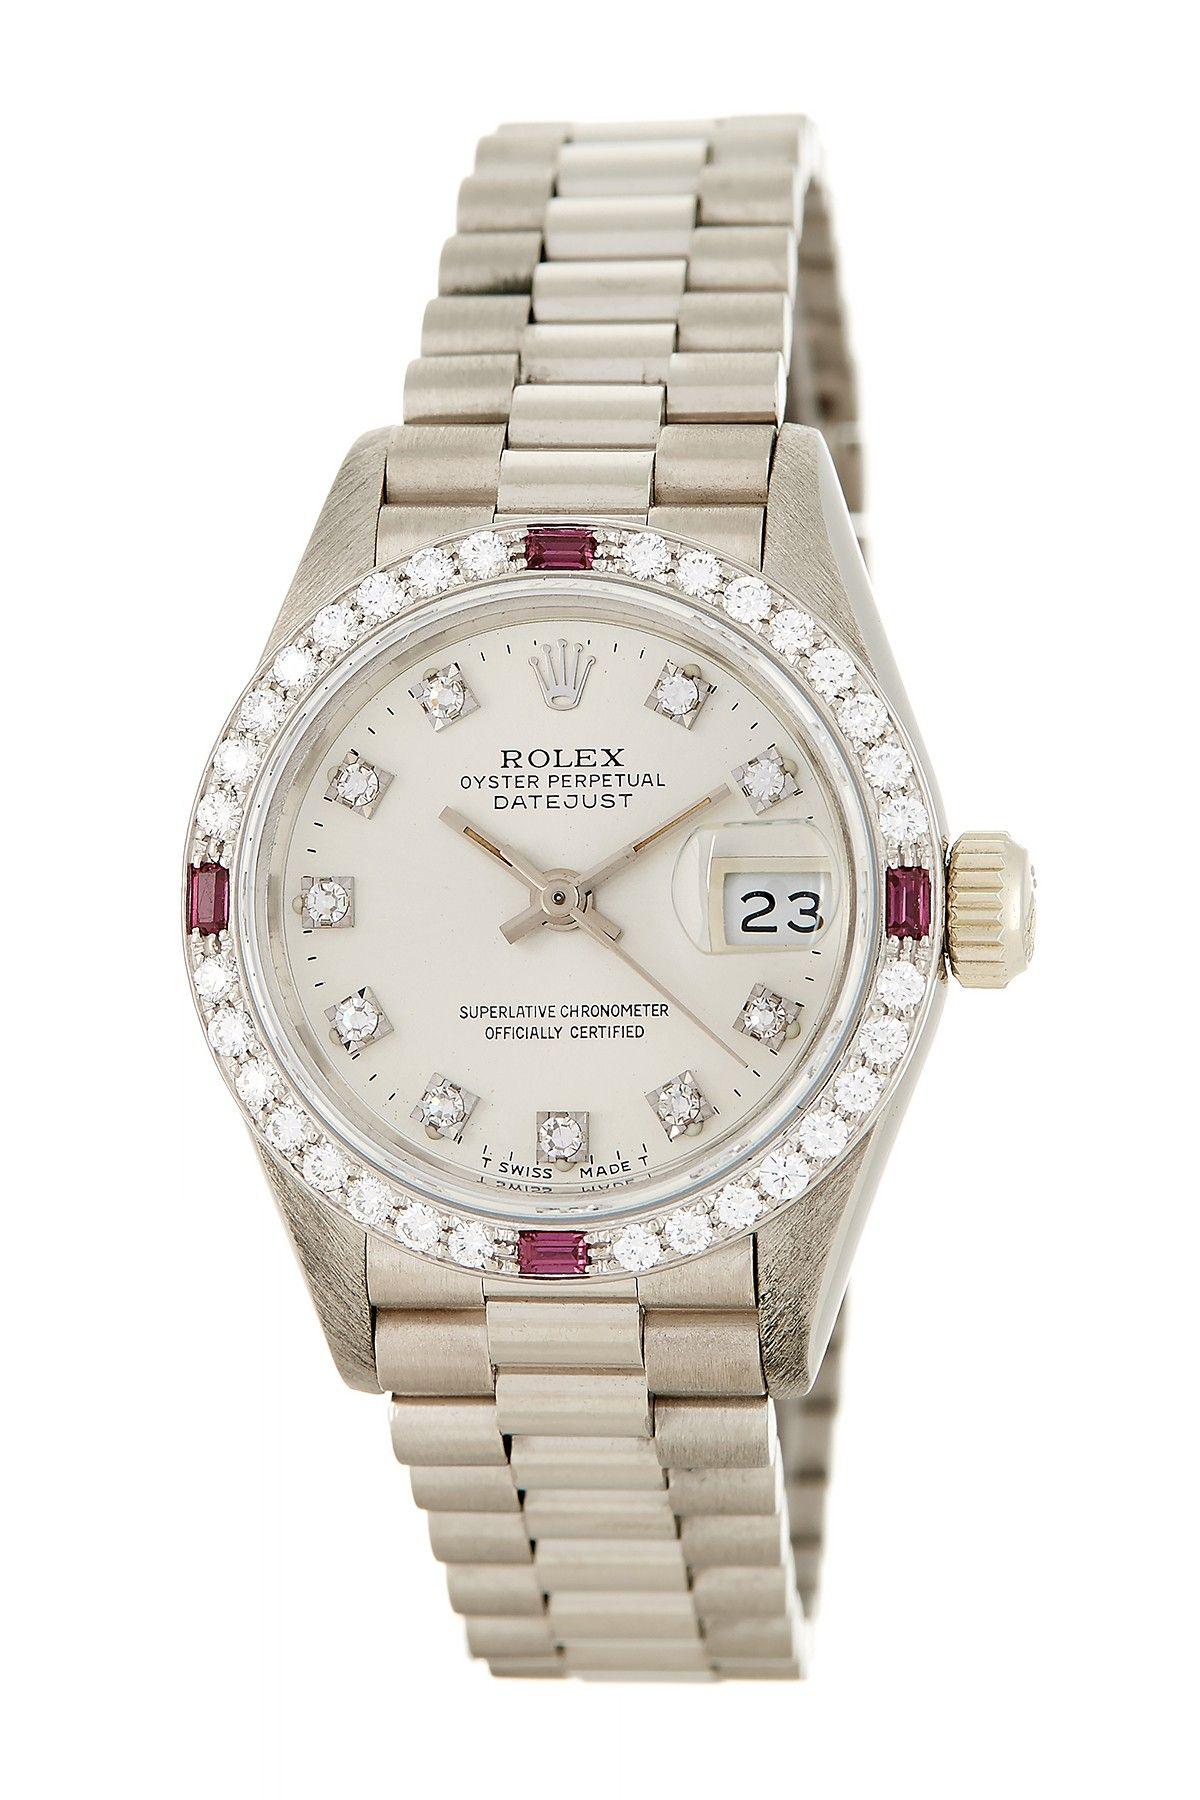 2ed9d6d4536 Relógios Femininos · Vintage Rolex Women s Datejust President Diamond  Automatic Watch